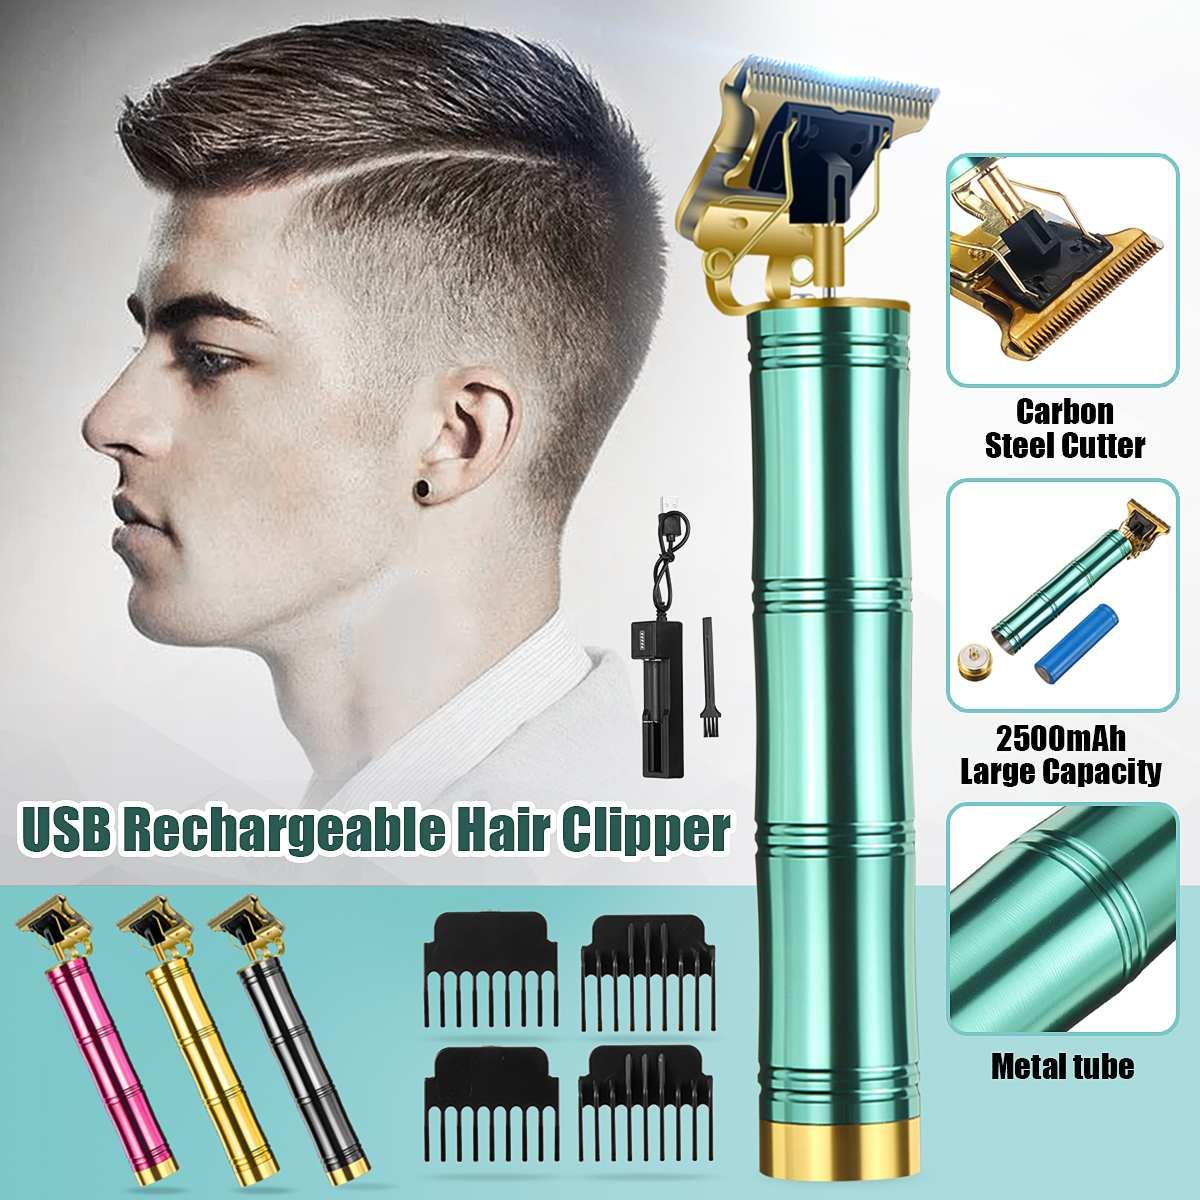 Cordless Electric Hair Trimmer 18650 Lithium-ion Battery Haircut Shaver Men Barber Hair Cutting Machine T-Blade Clipper Set